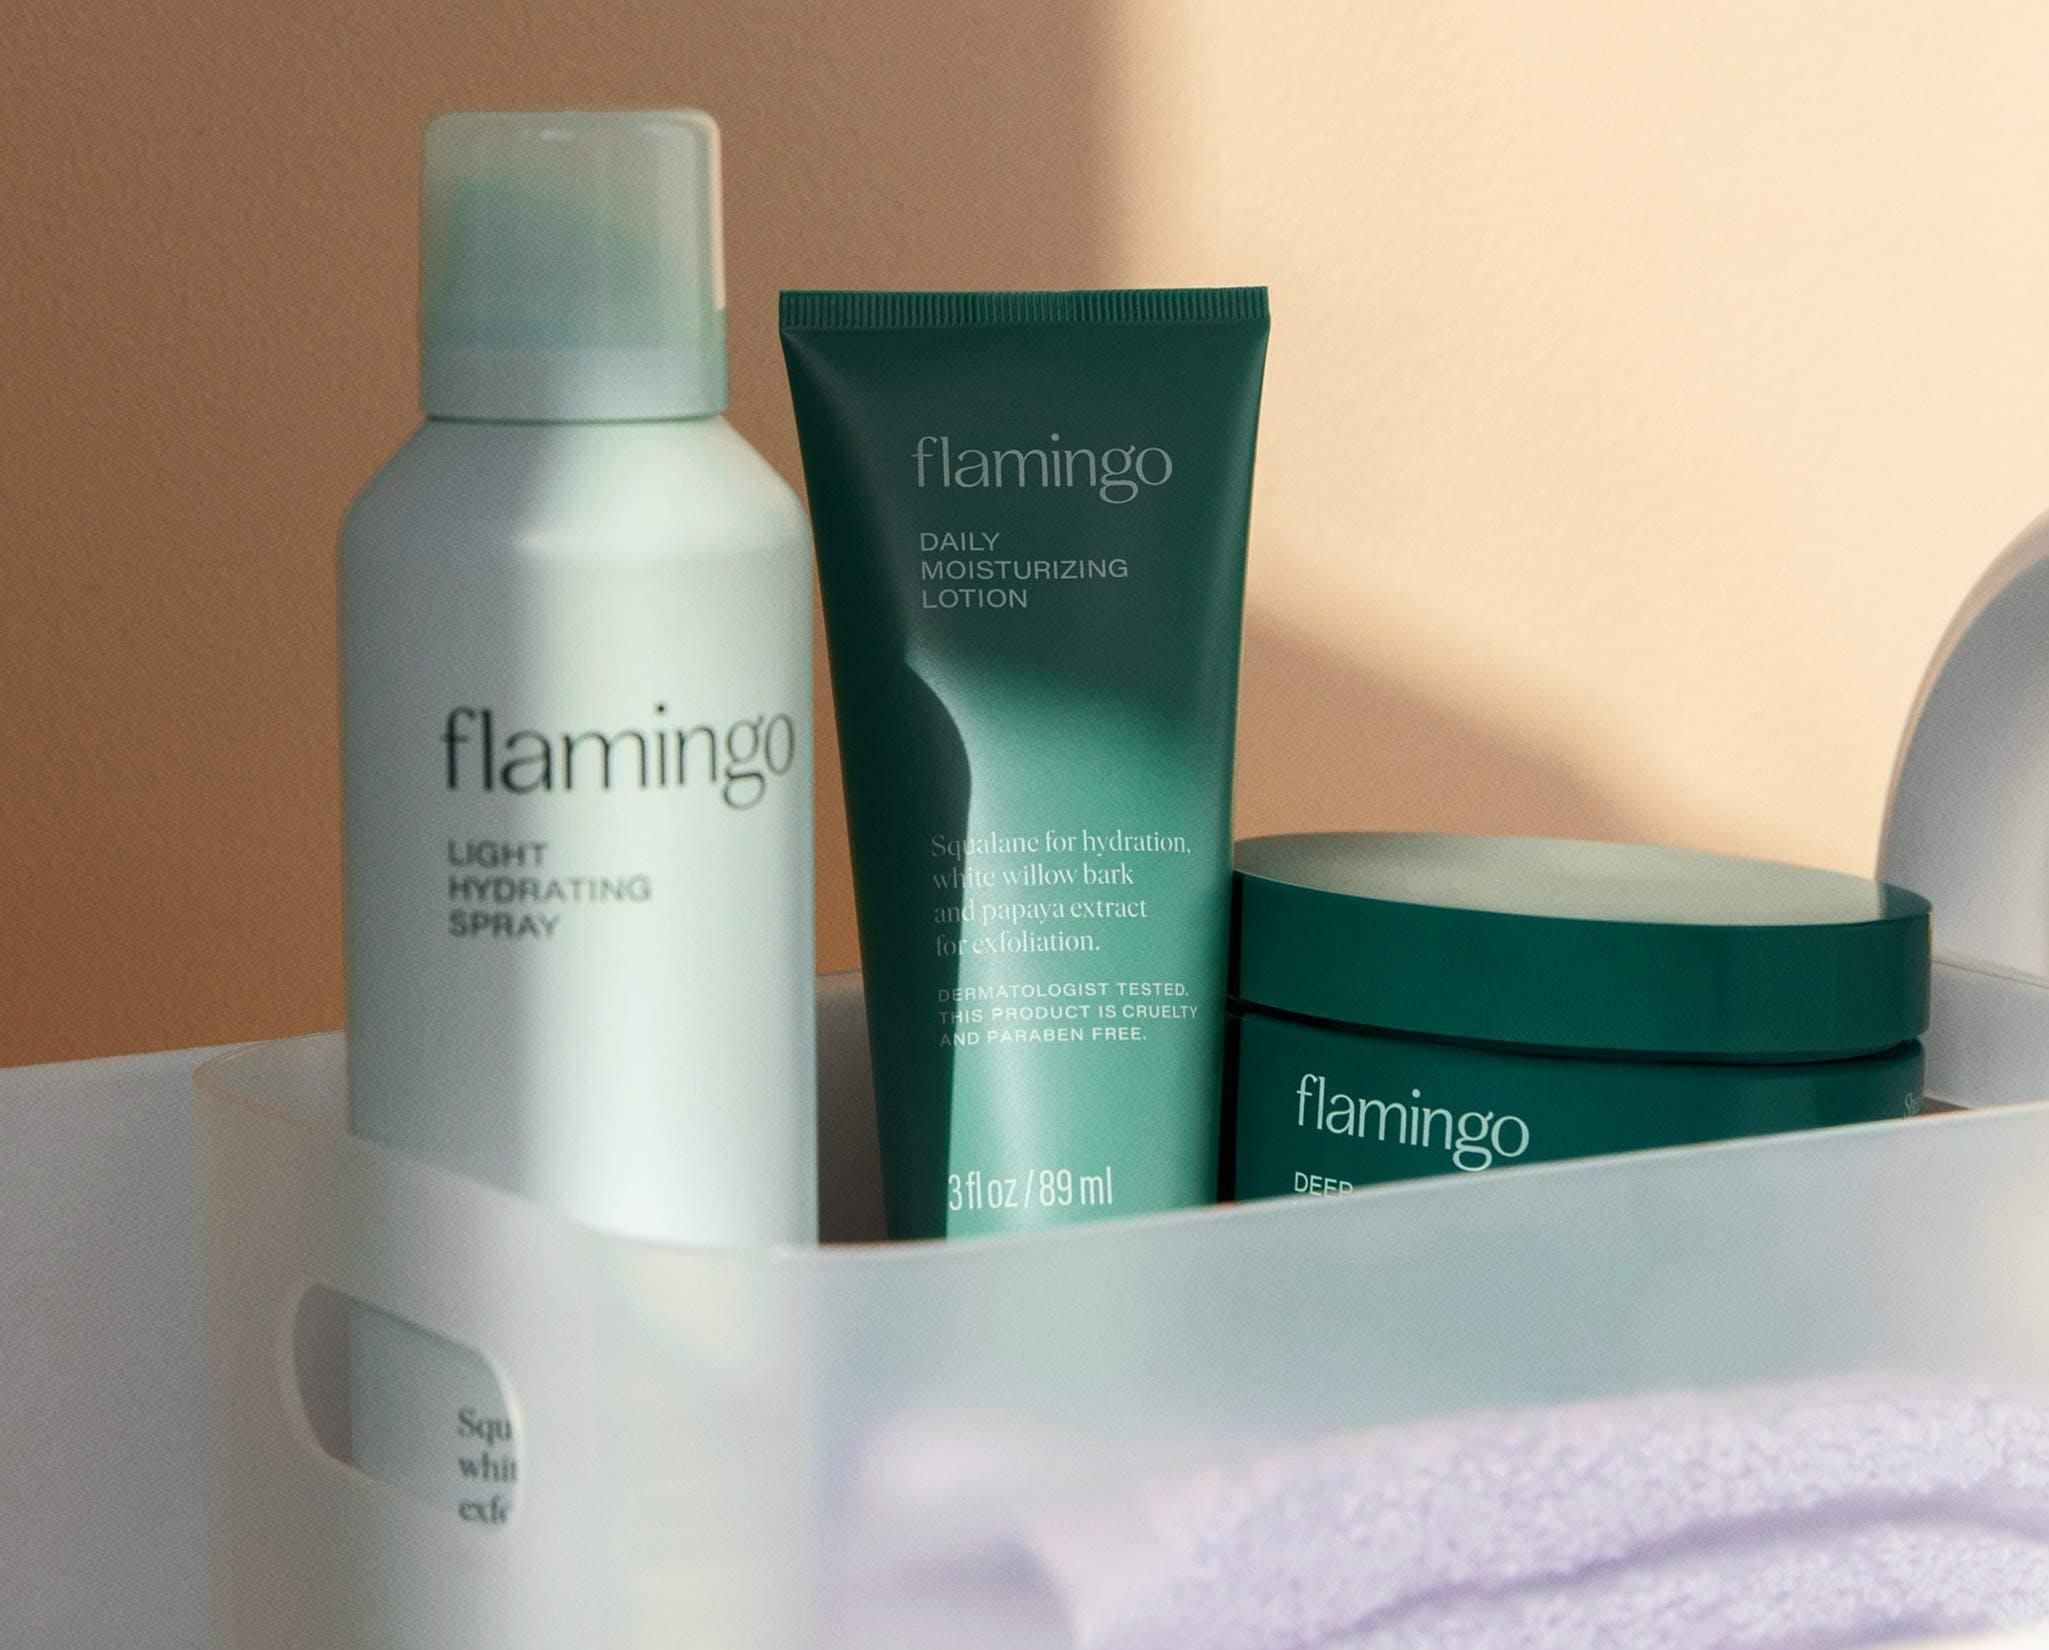 Light hydrating spray, daily moisturizing lotion, and deep nourishing cream in a bin